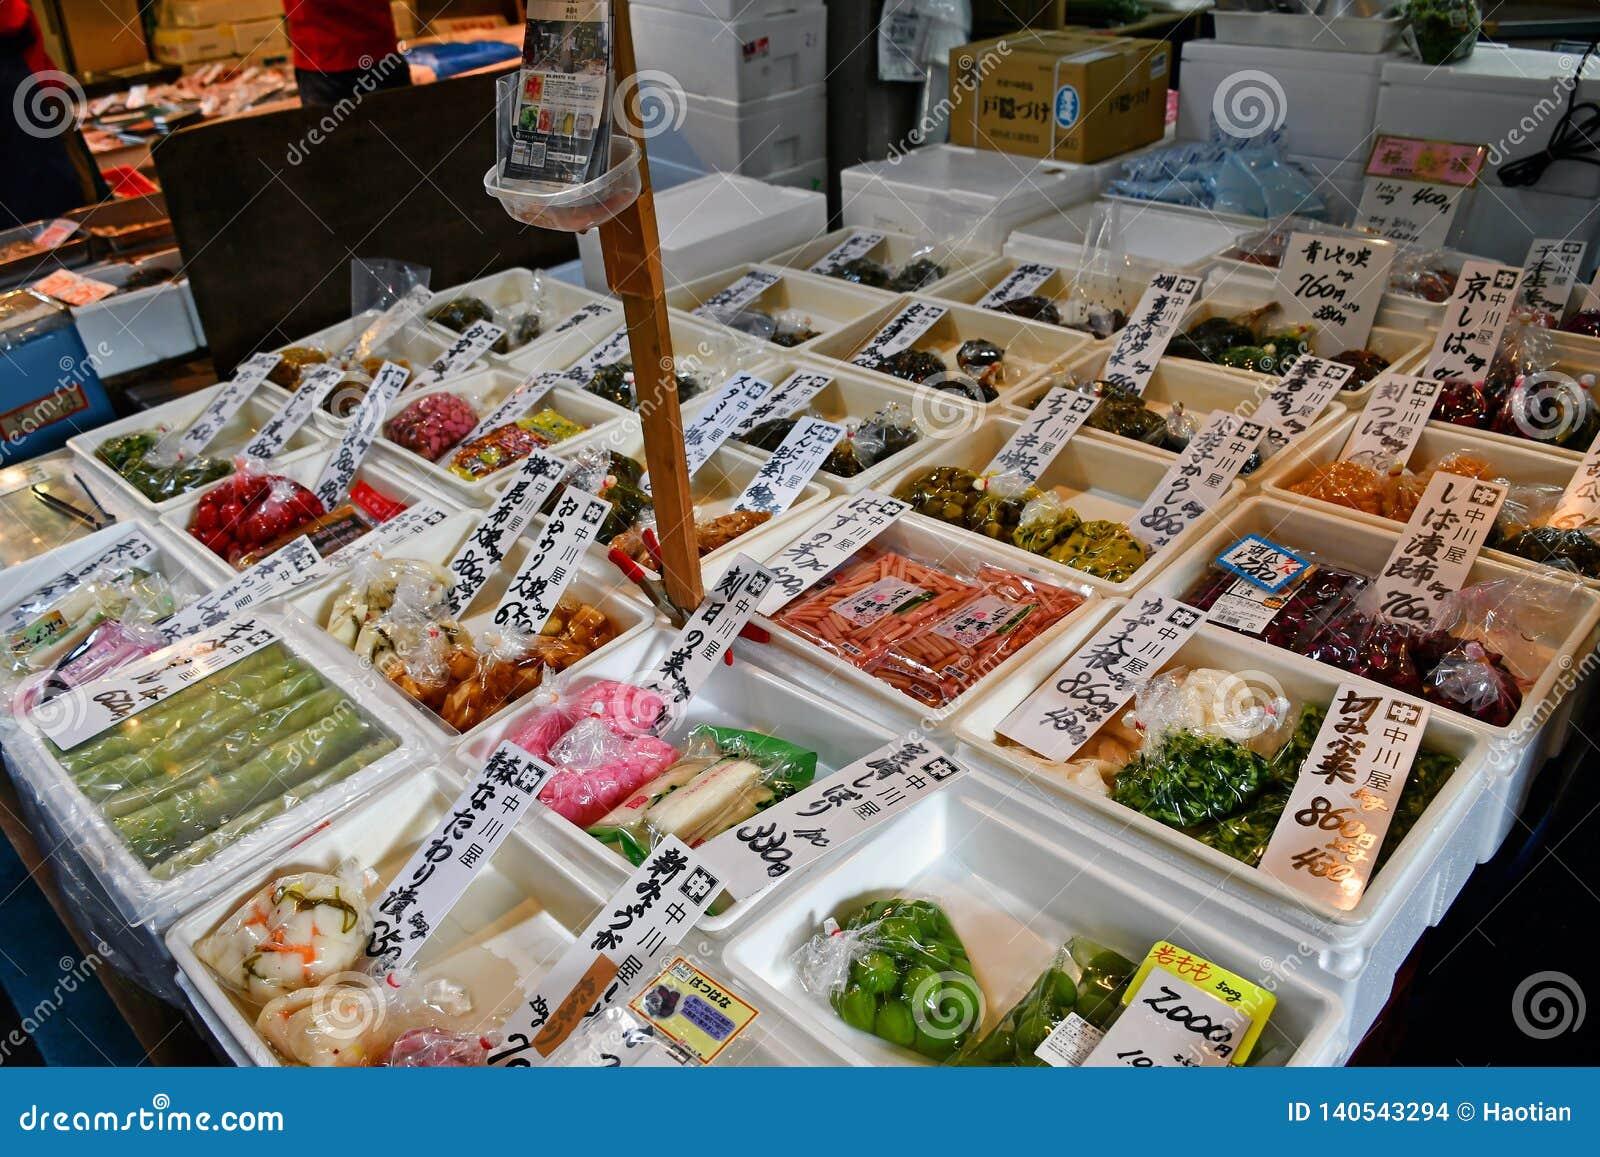 Japanese Pickled Vegetables On Sale At Tsukiji Outer Market, Tokyo